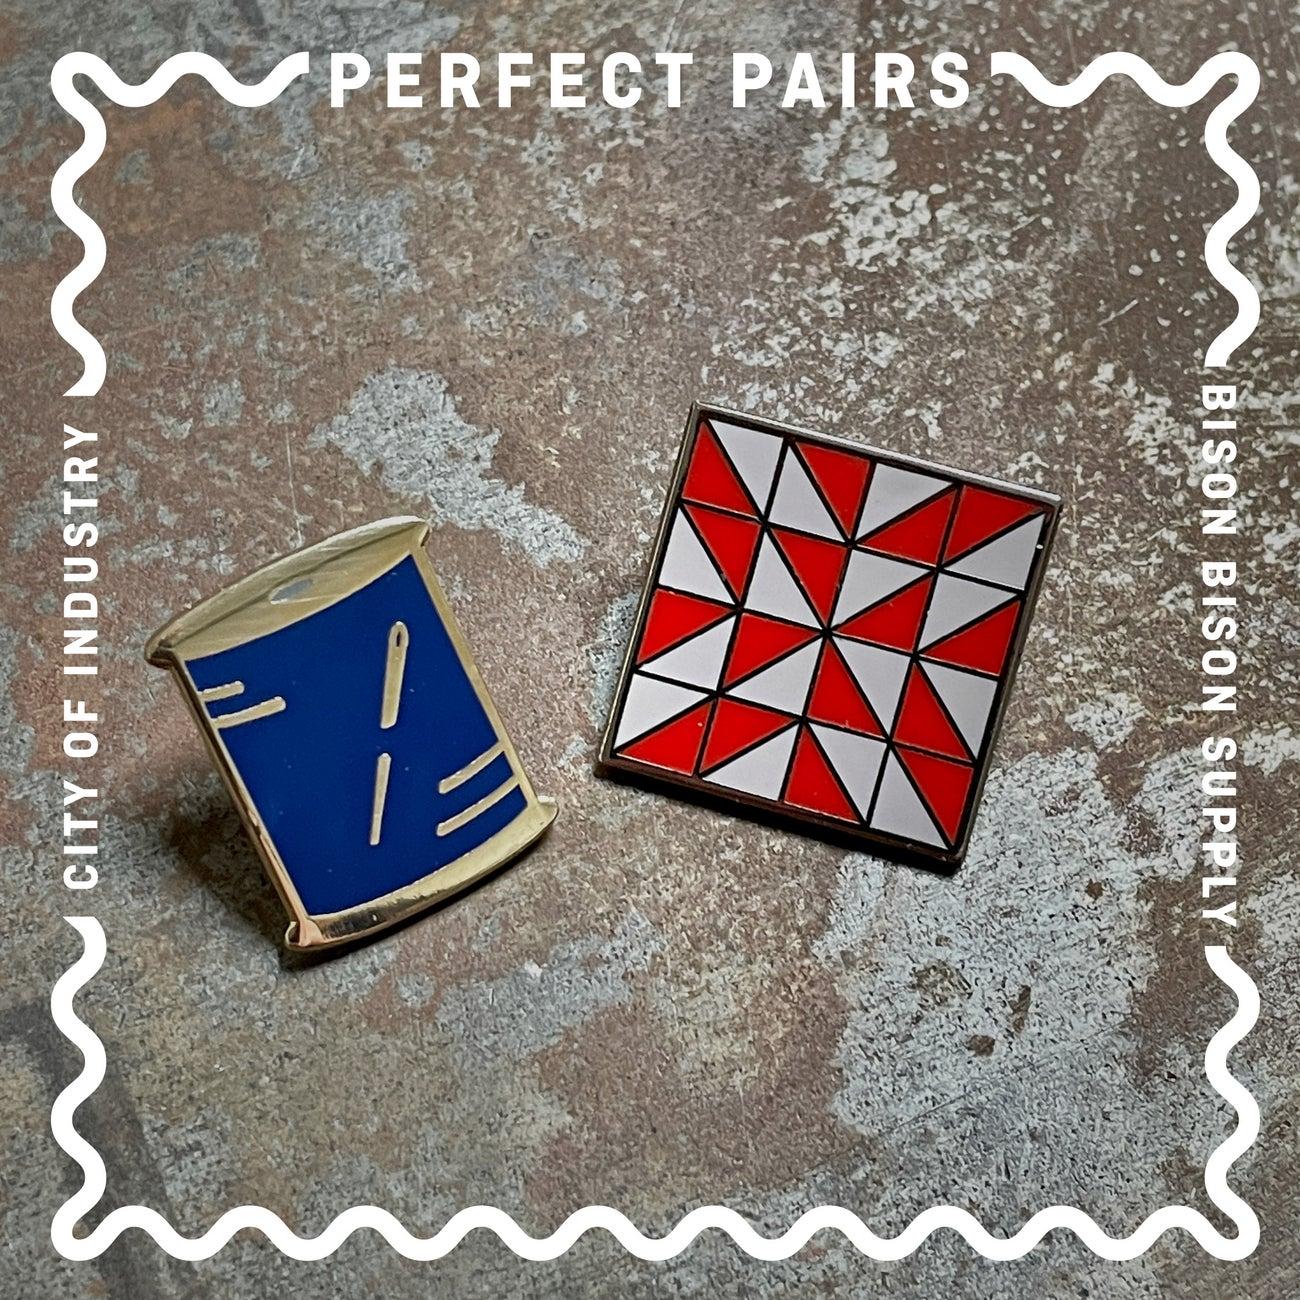 Image of Perfect Pairs: Thread + Quilt Block